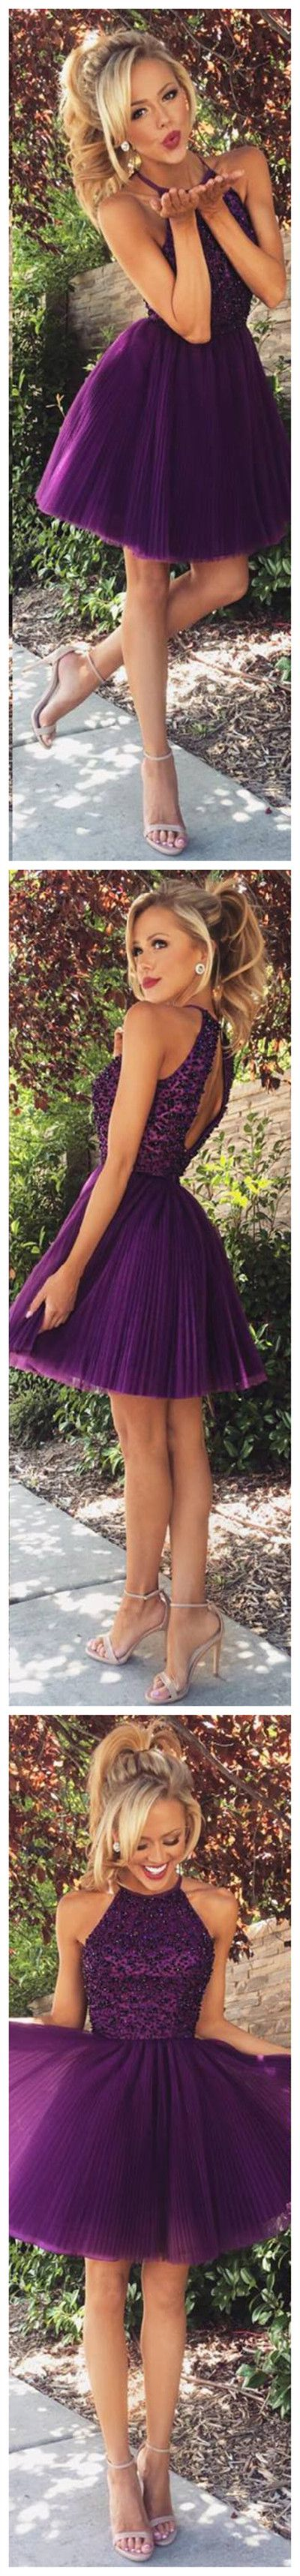 Purple high neck open back homecoming dressshort prom dress love